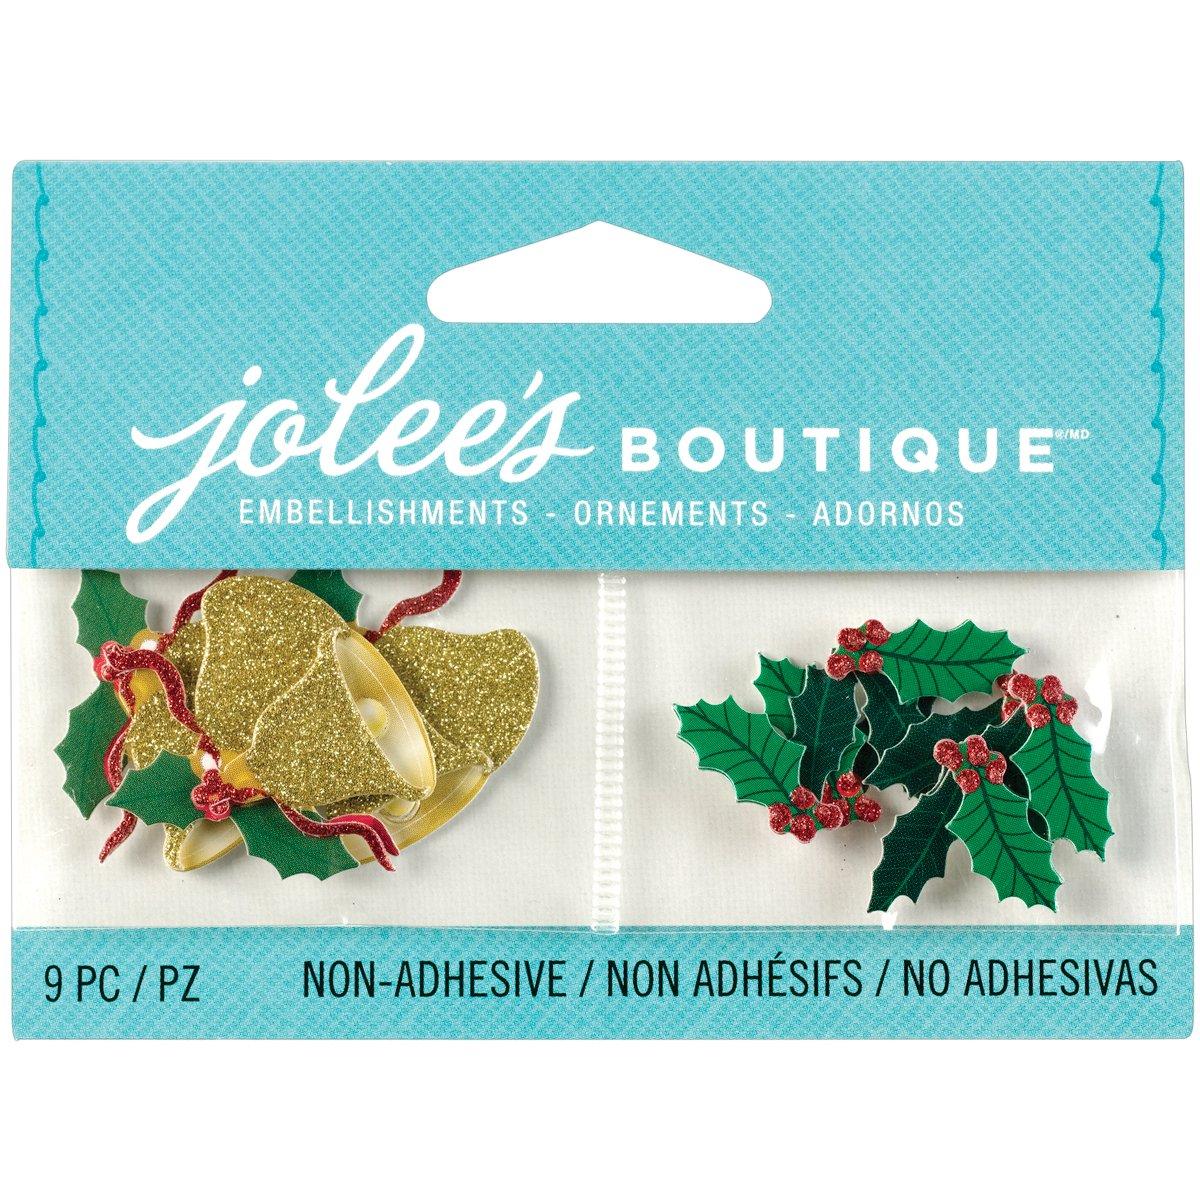 Jolee's Boutique 50-00624 Scrapbooking Embellishments, Mini Jingle Bells EKS